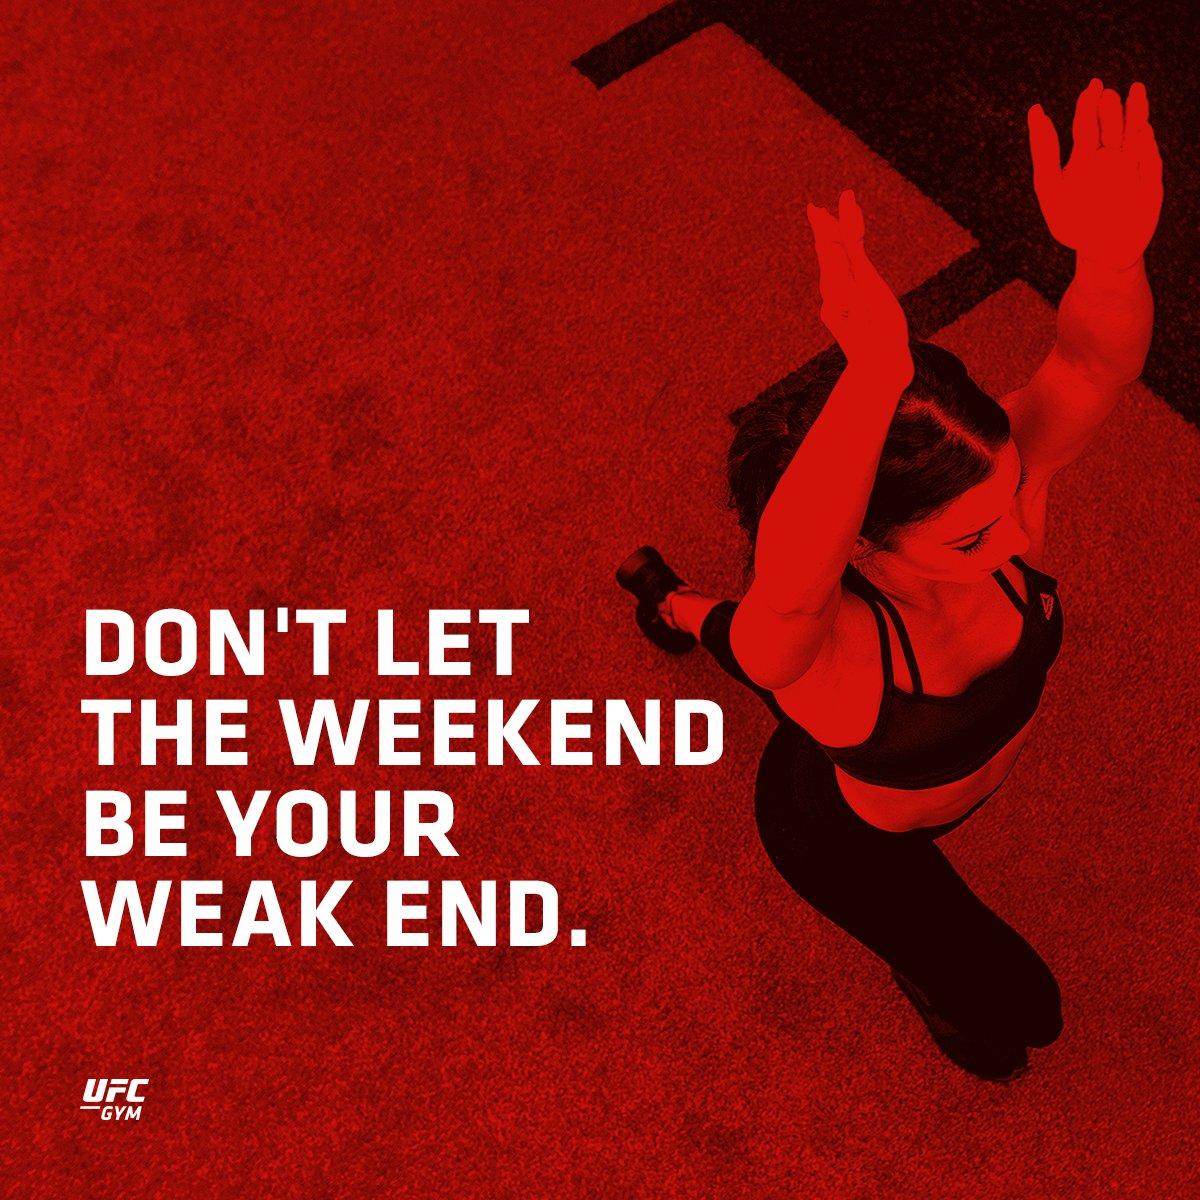 FRIDAY'S CLASS SCHEDULE:  9:30am – DUT   5pm – DUT   6pm – Fight Fit   7pm – BJJ   8:30pm – MMA https://t.co/uJHsbzHlLx